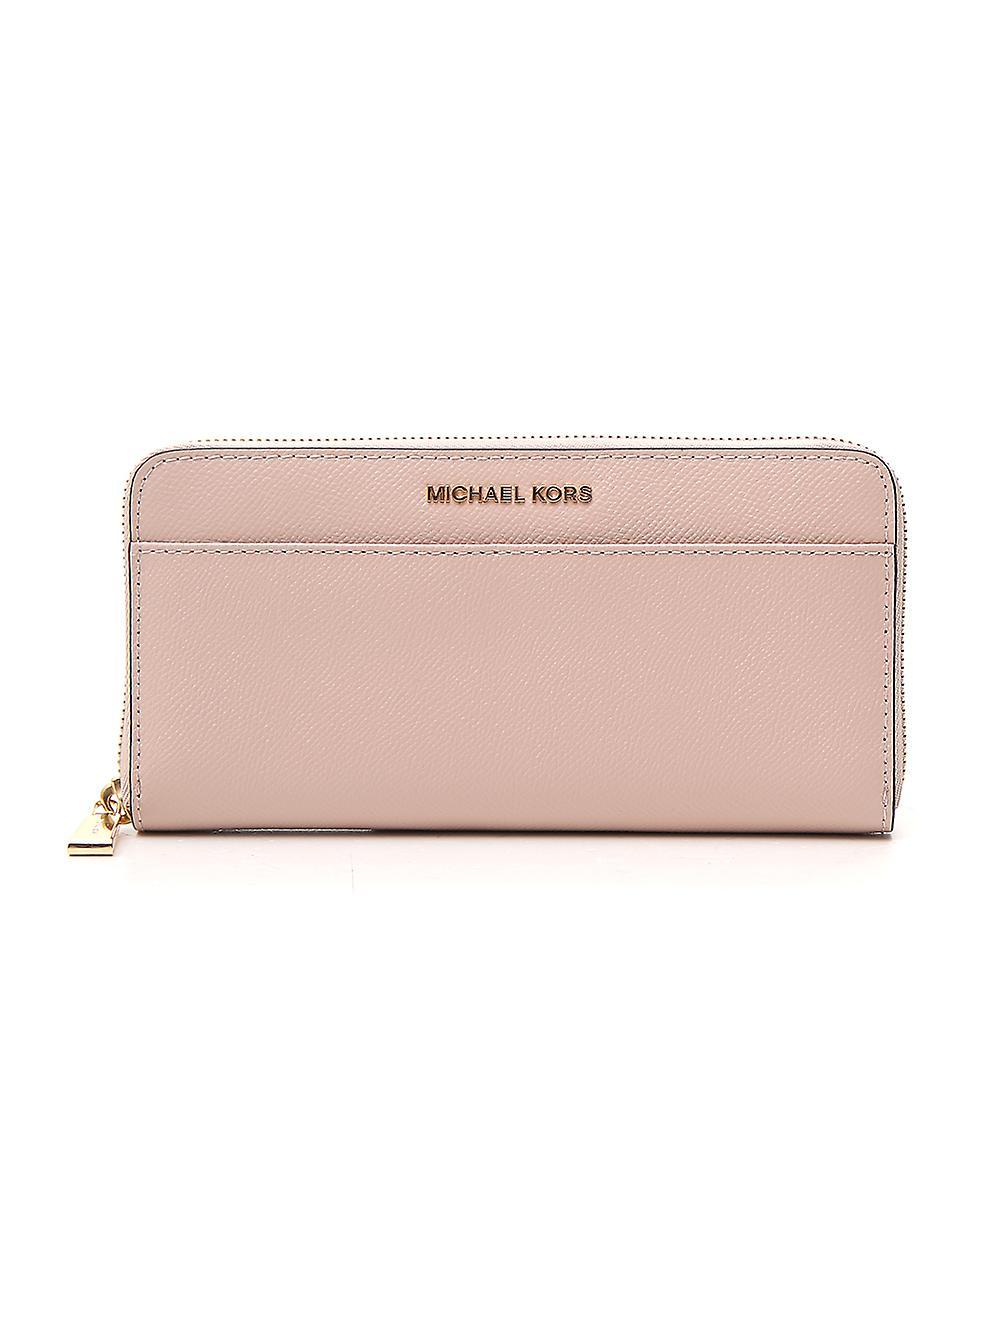 613c328f8fe19a Michael Kors Pink Leather Wallet | Fruugo